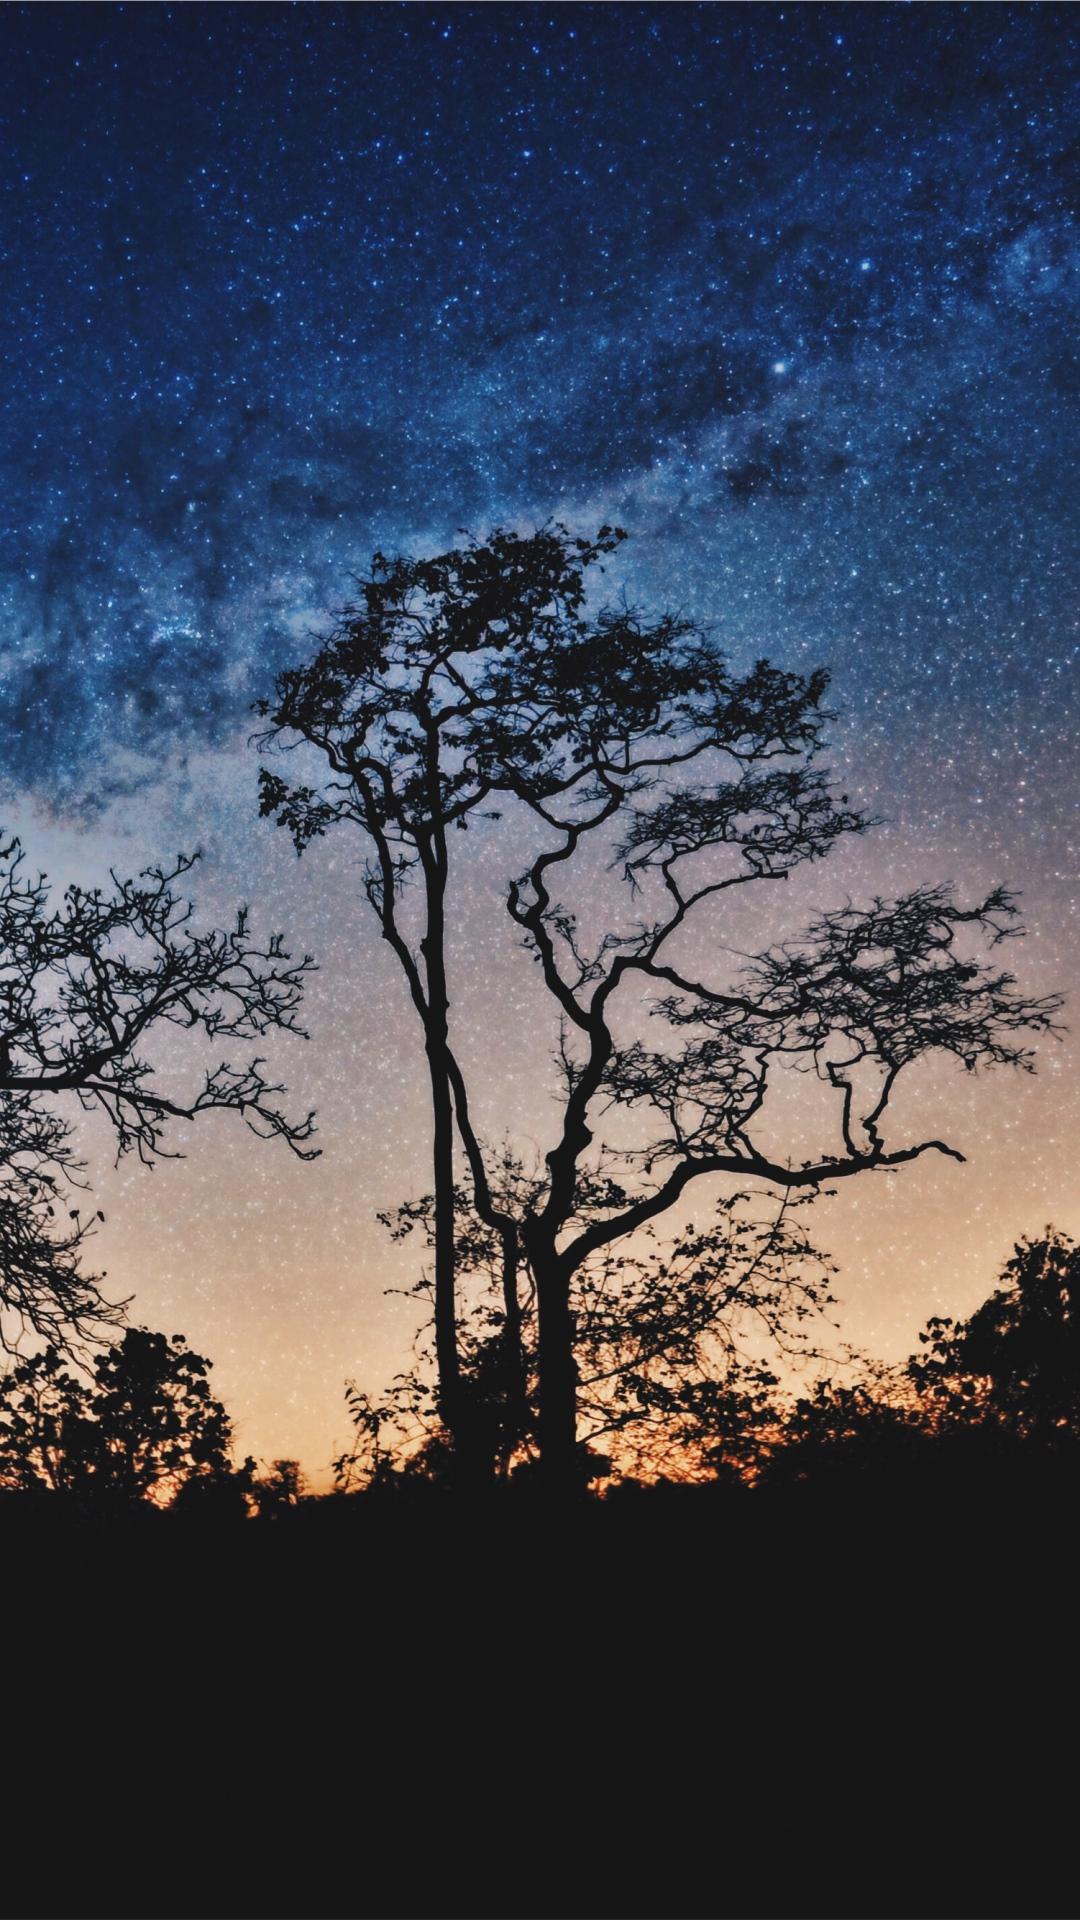 iphone wallpaper trees night stars sky Trees